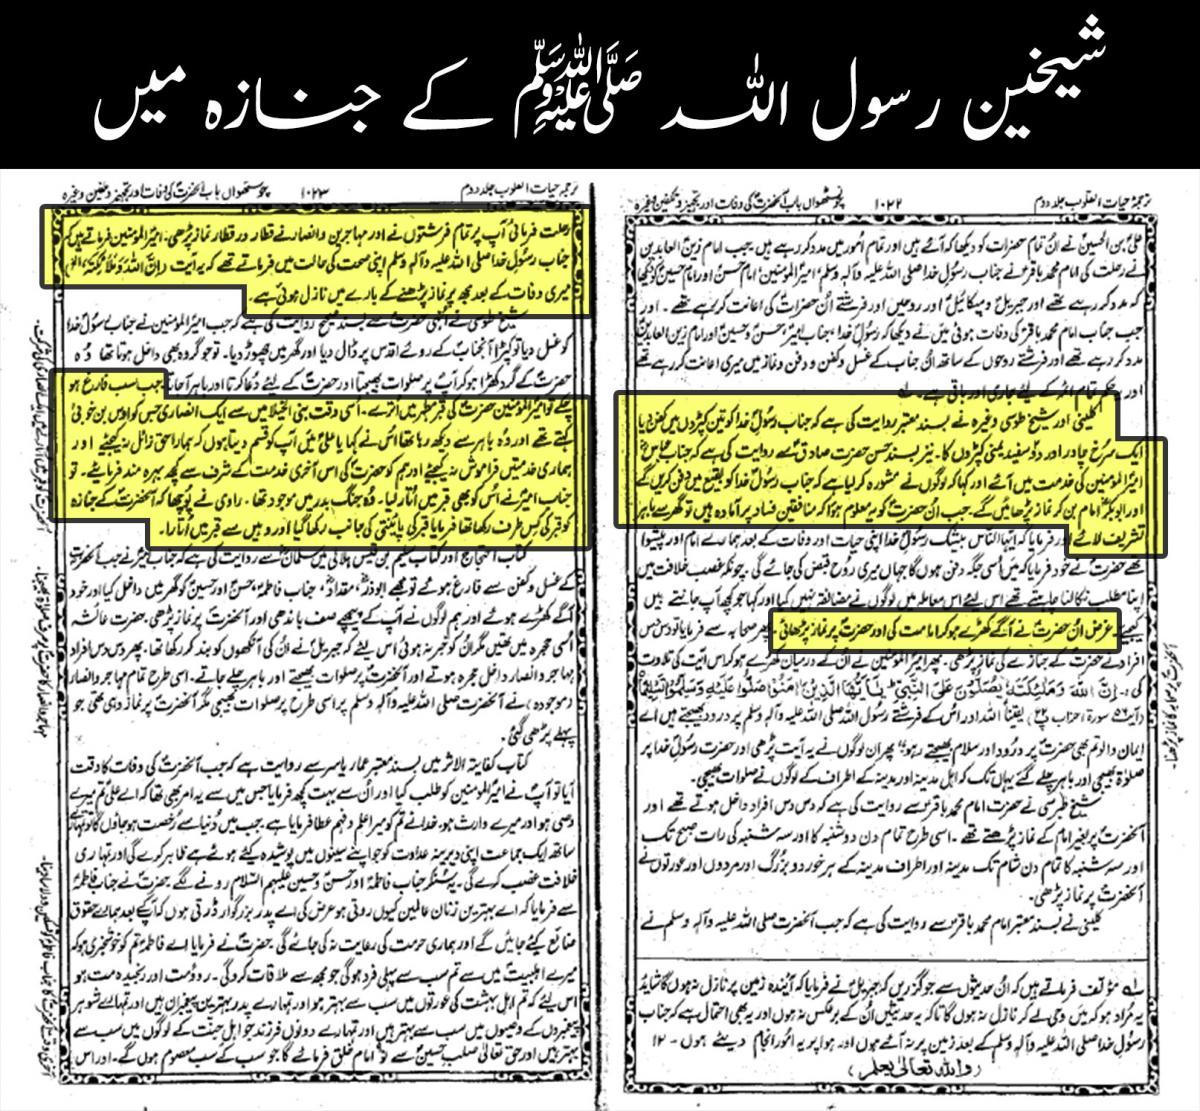 Hayat ul quloob urdu